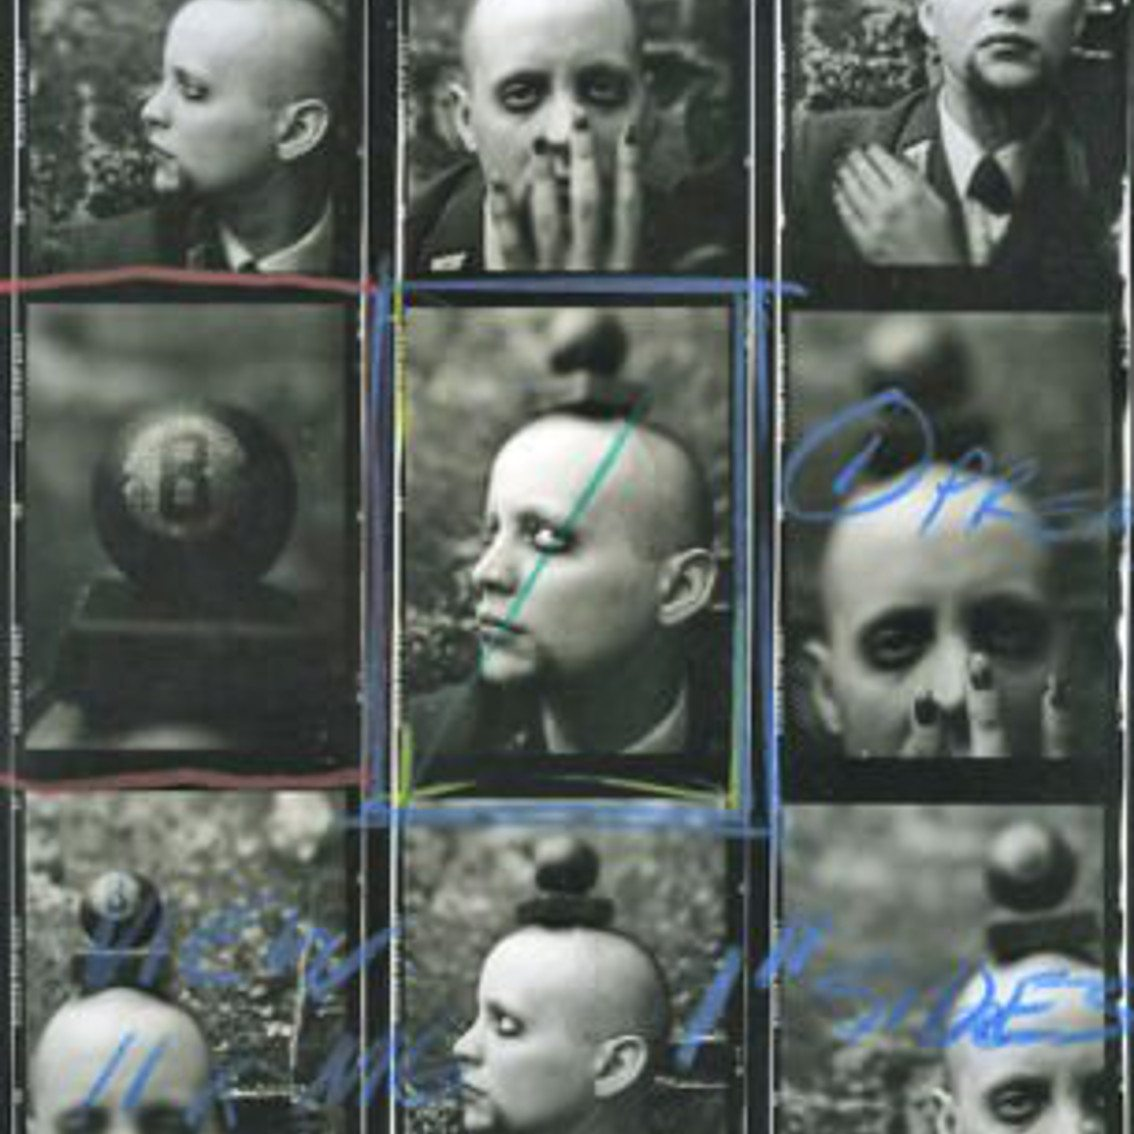 Ex-Marilyn Manson keyboardist Madonna Wayne Gacy has a beef with Smashing Pumpkins frontman Billy Corgan